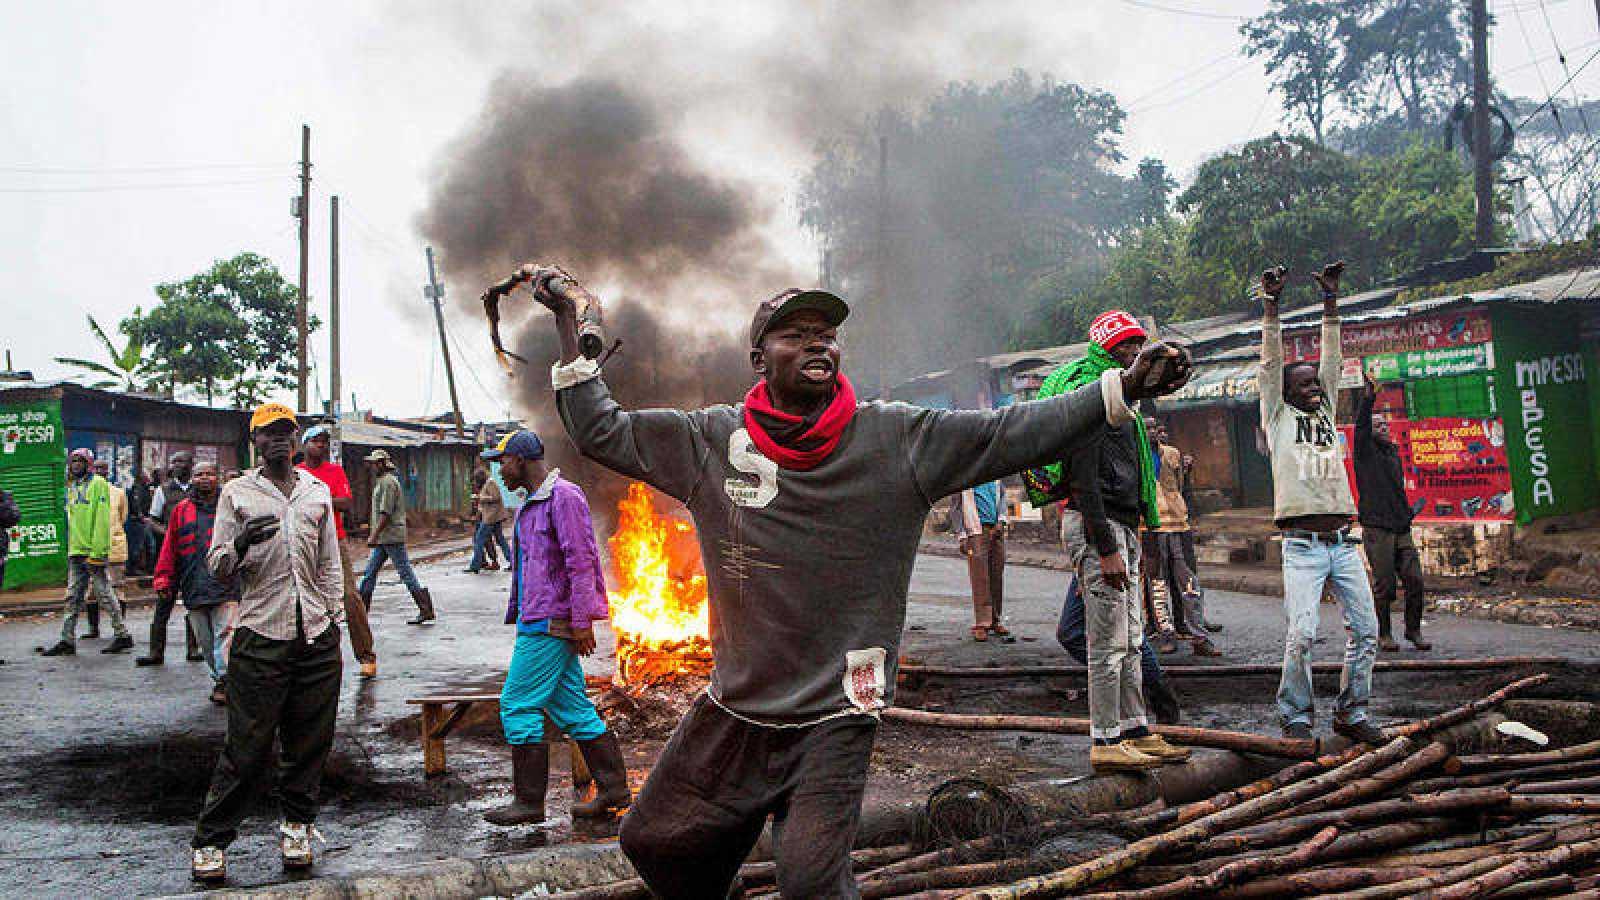 Un grupo de manfiestantes en el barrio chabolista de Kibera, Nairobi.